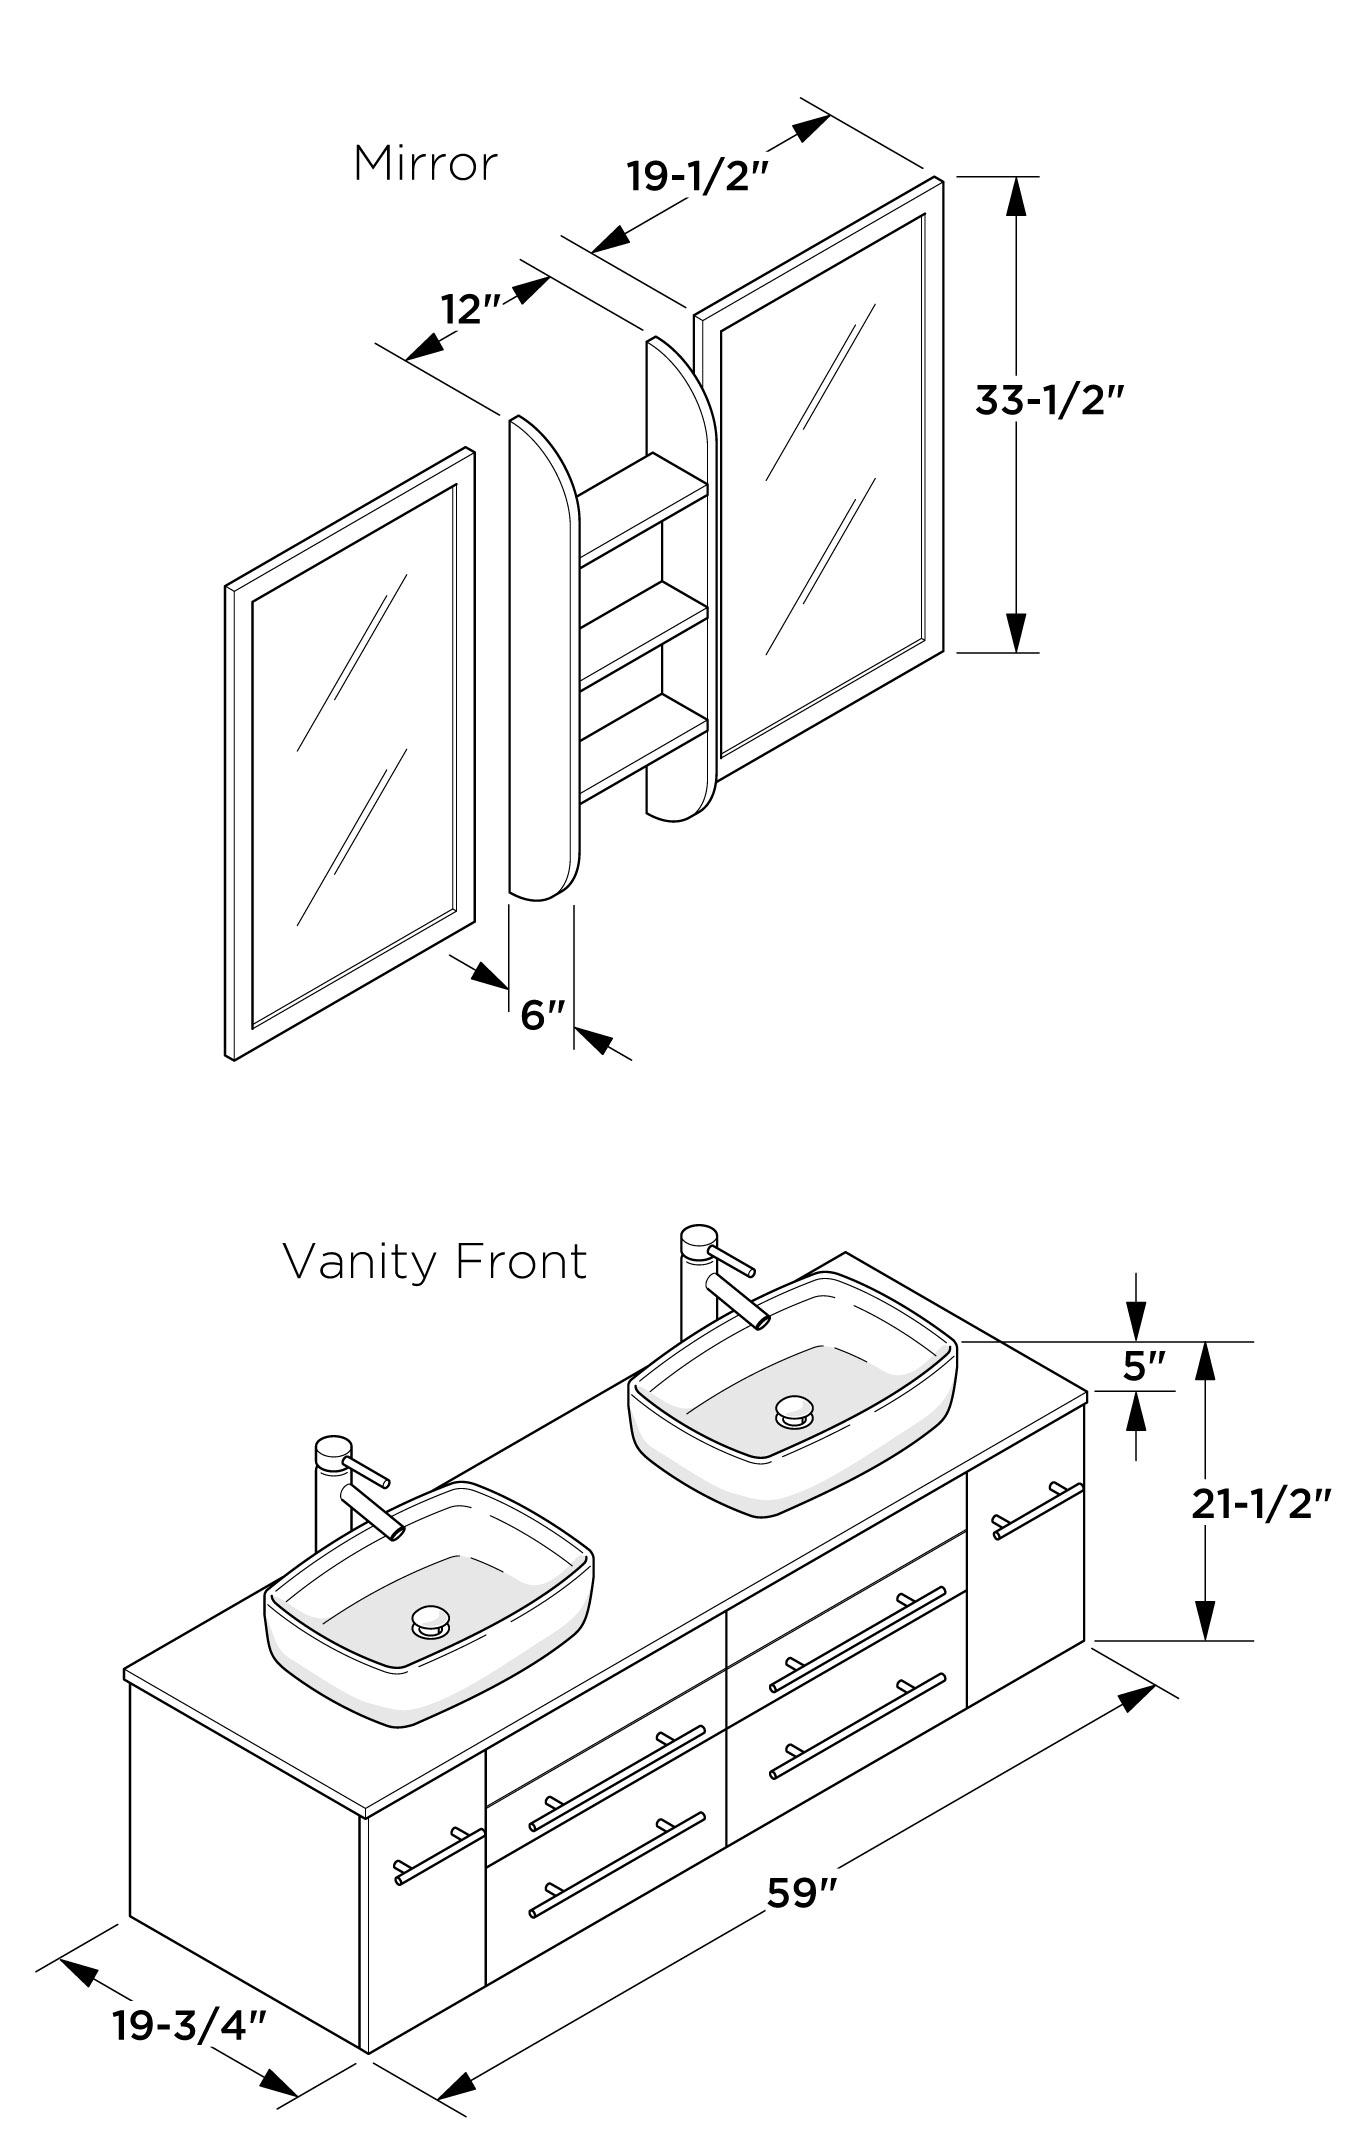 Double bathroom sink dimensions - Dimensions